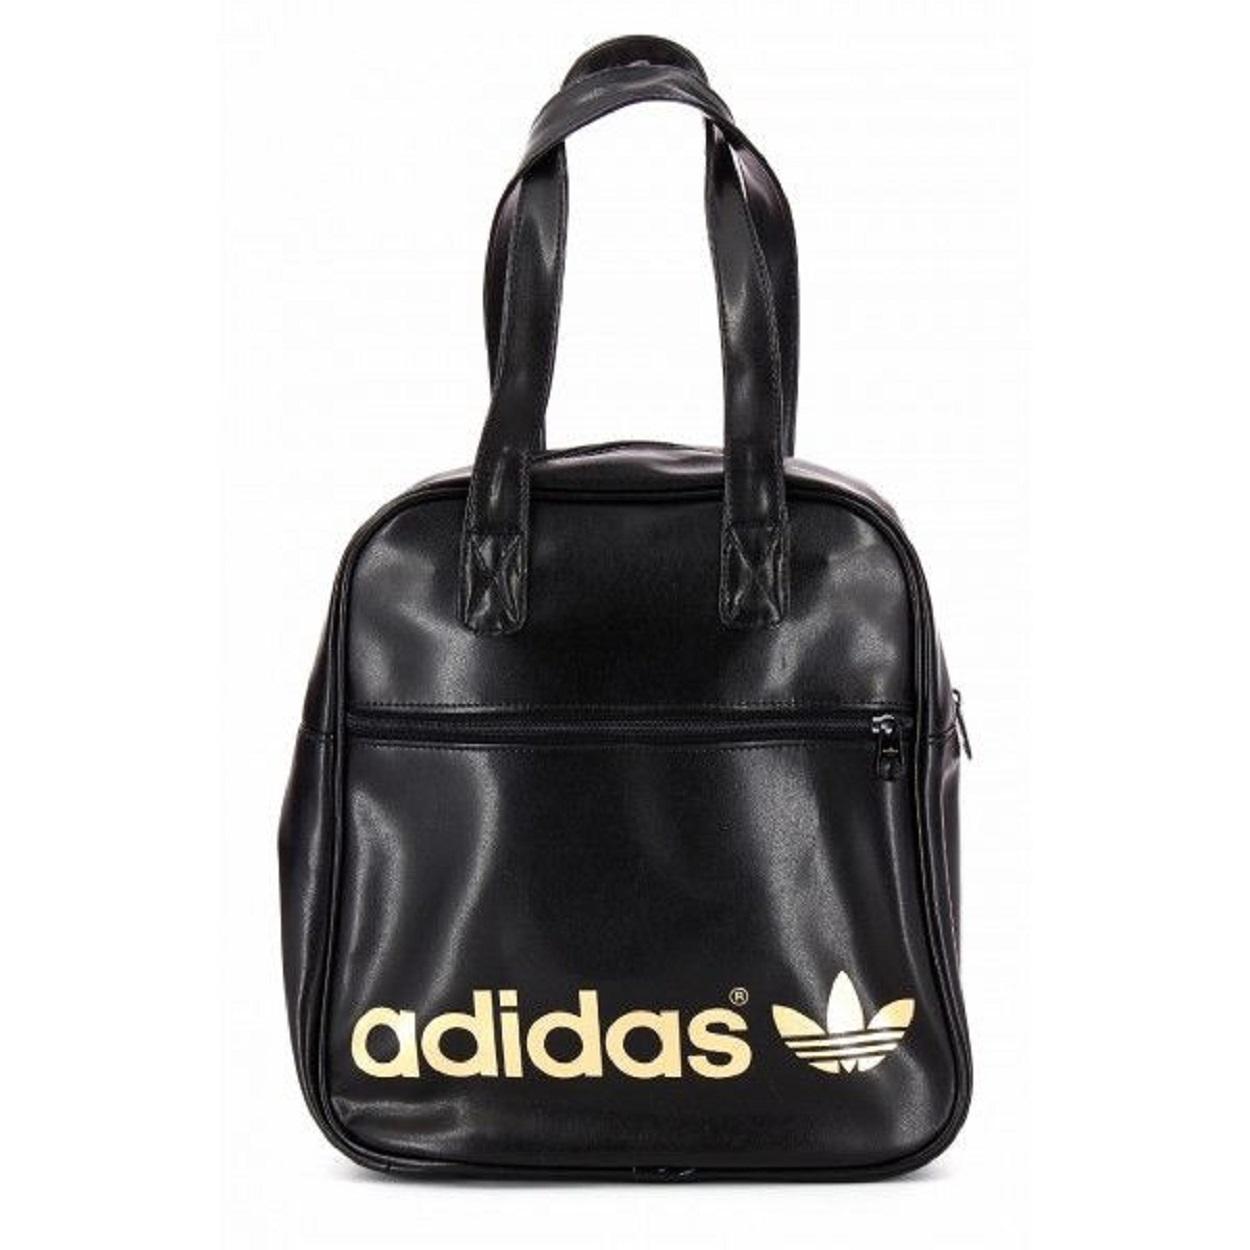 Adidas Originals AC Adicolor Bowling Bag Handtasche Schultertasche ...